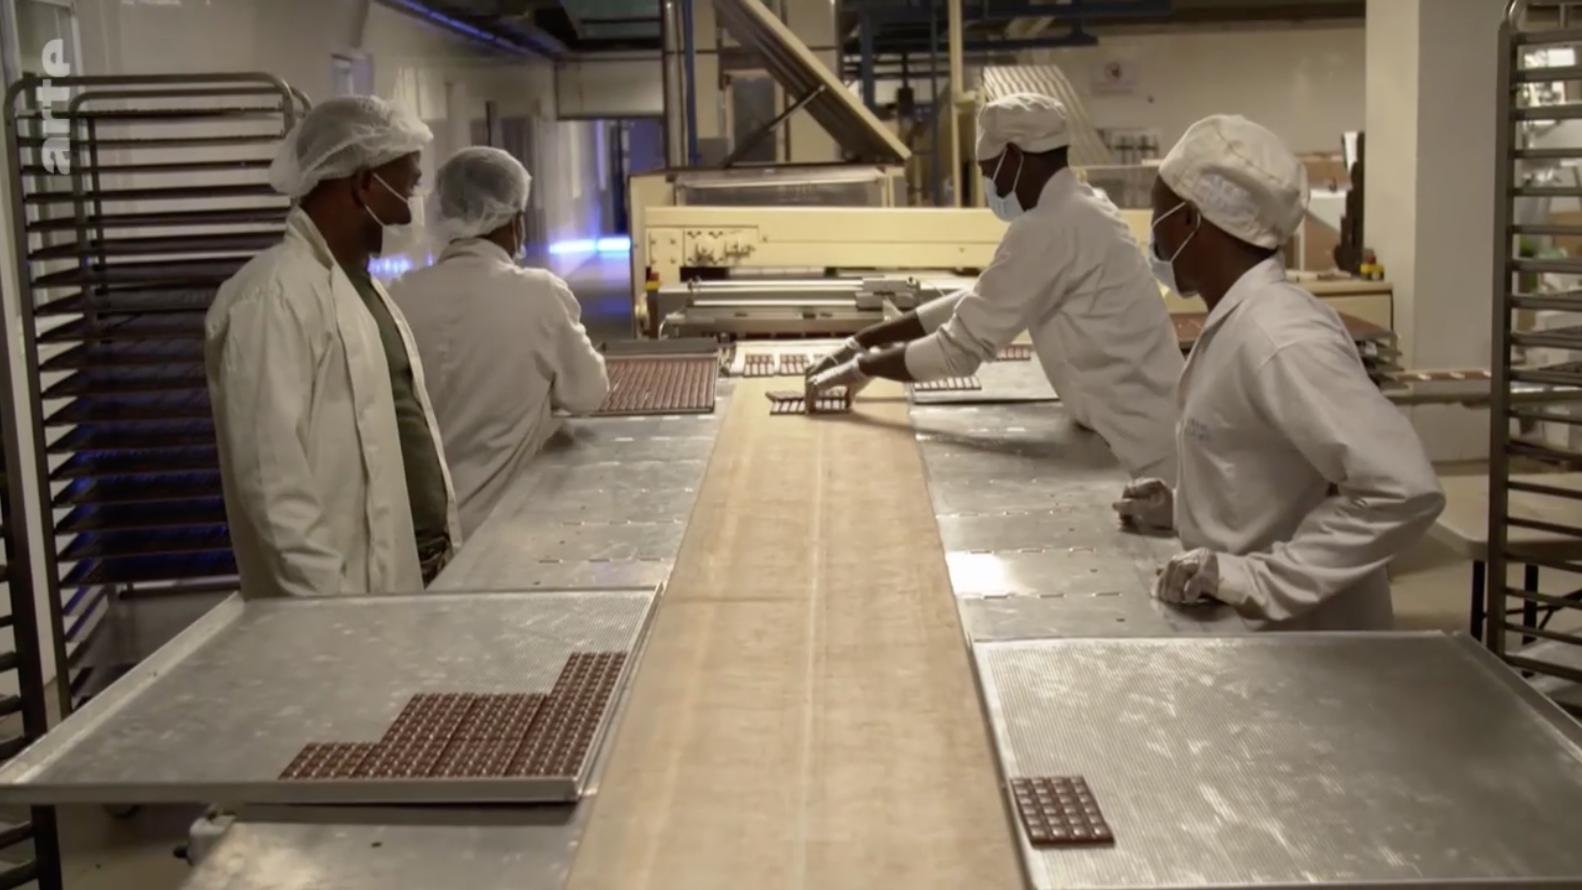 Fabrication du chocolat selon le principe du bean-to-bar : l'initiative de Hendrik Reimers au Ghana